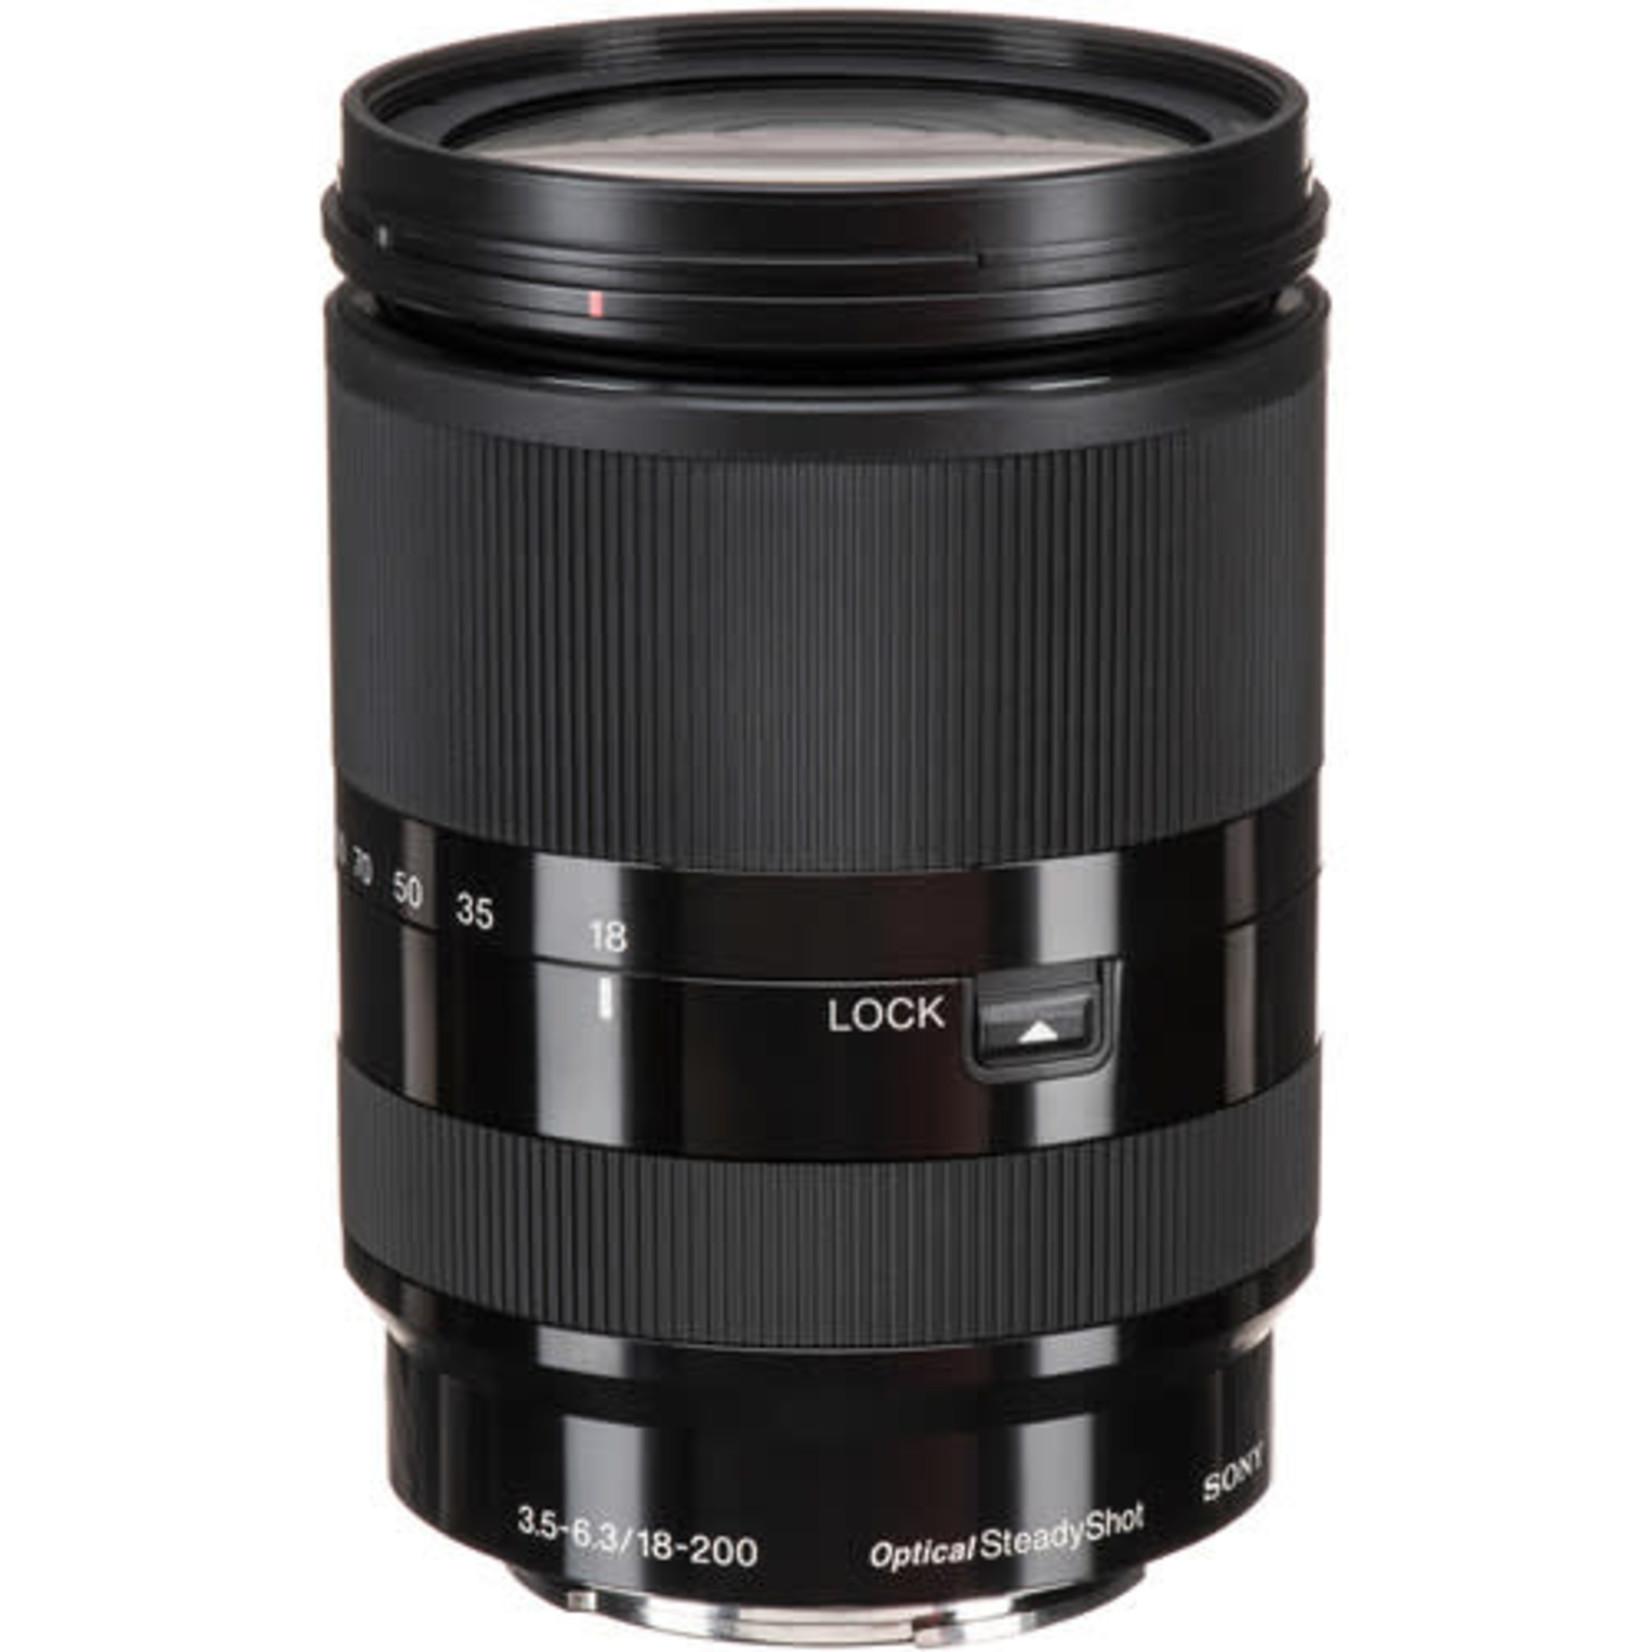 Sony Sony E 18-200mm f/3.5-6.3 OSS LE Lens